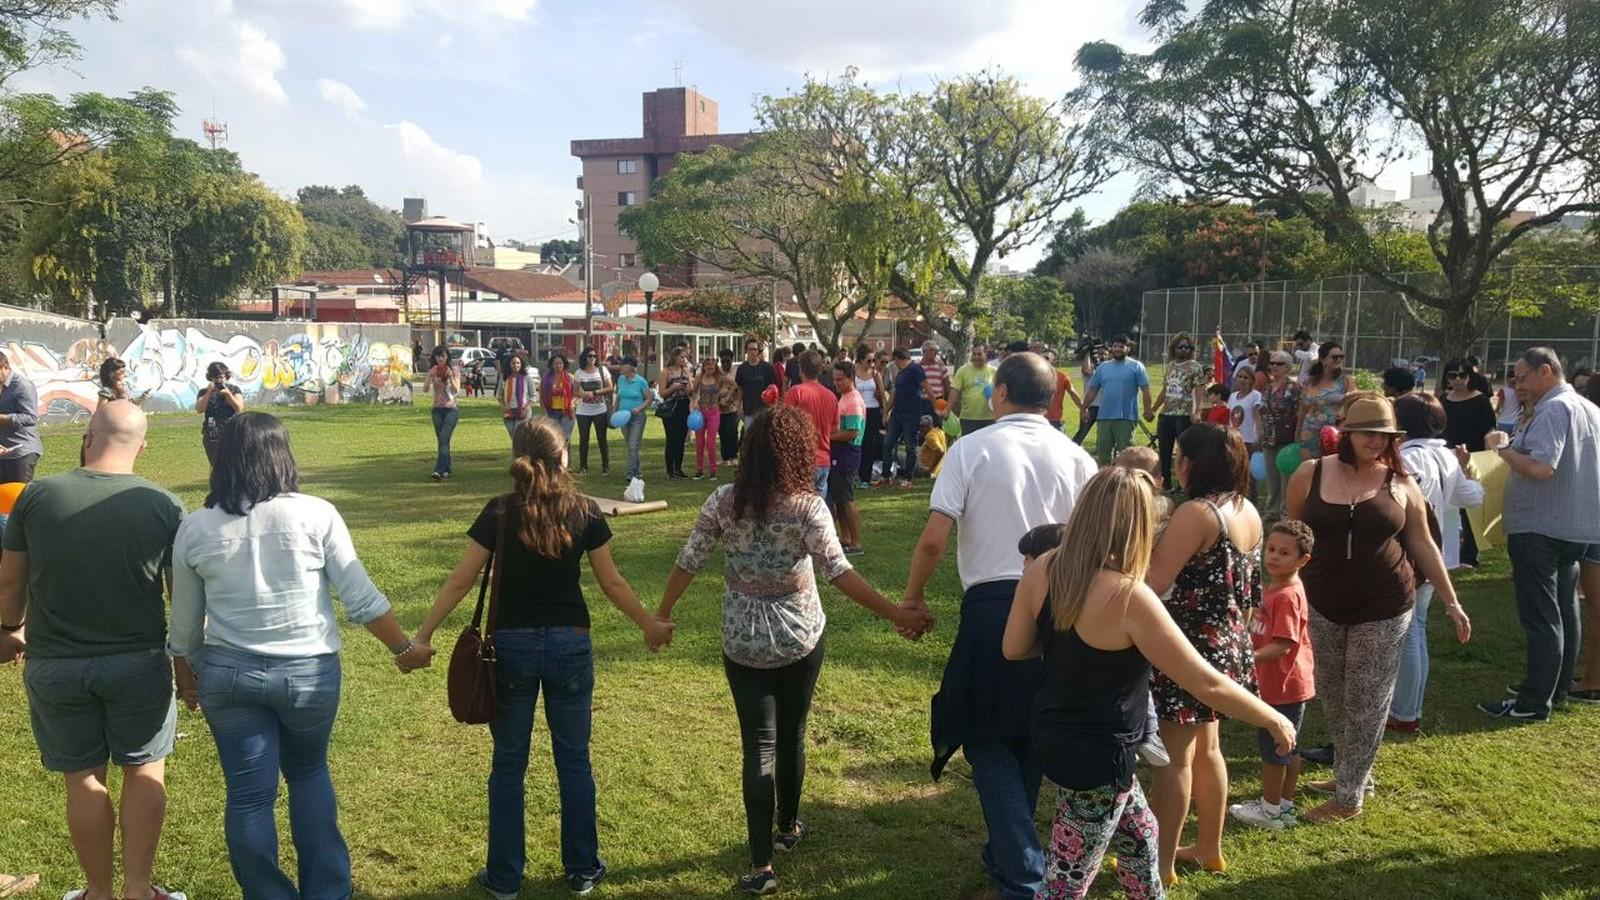 Amigos de casal vítima de homofobia realizam protesto em Curitiba